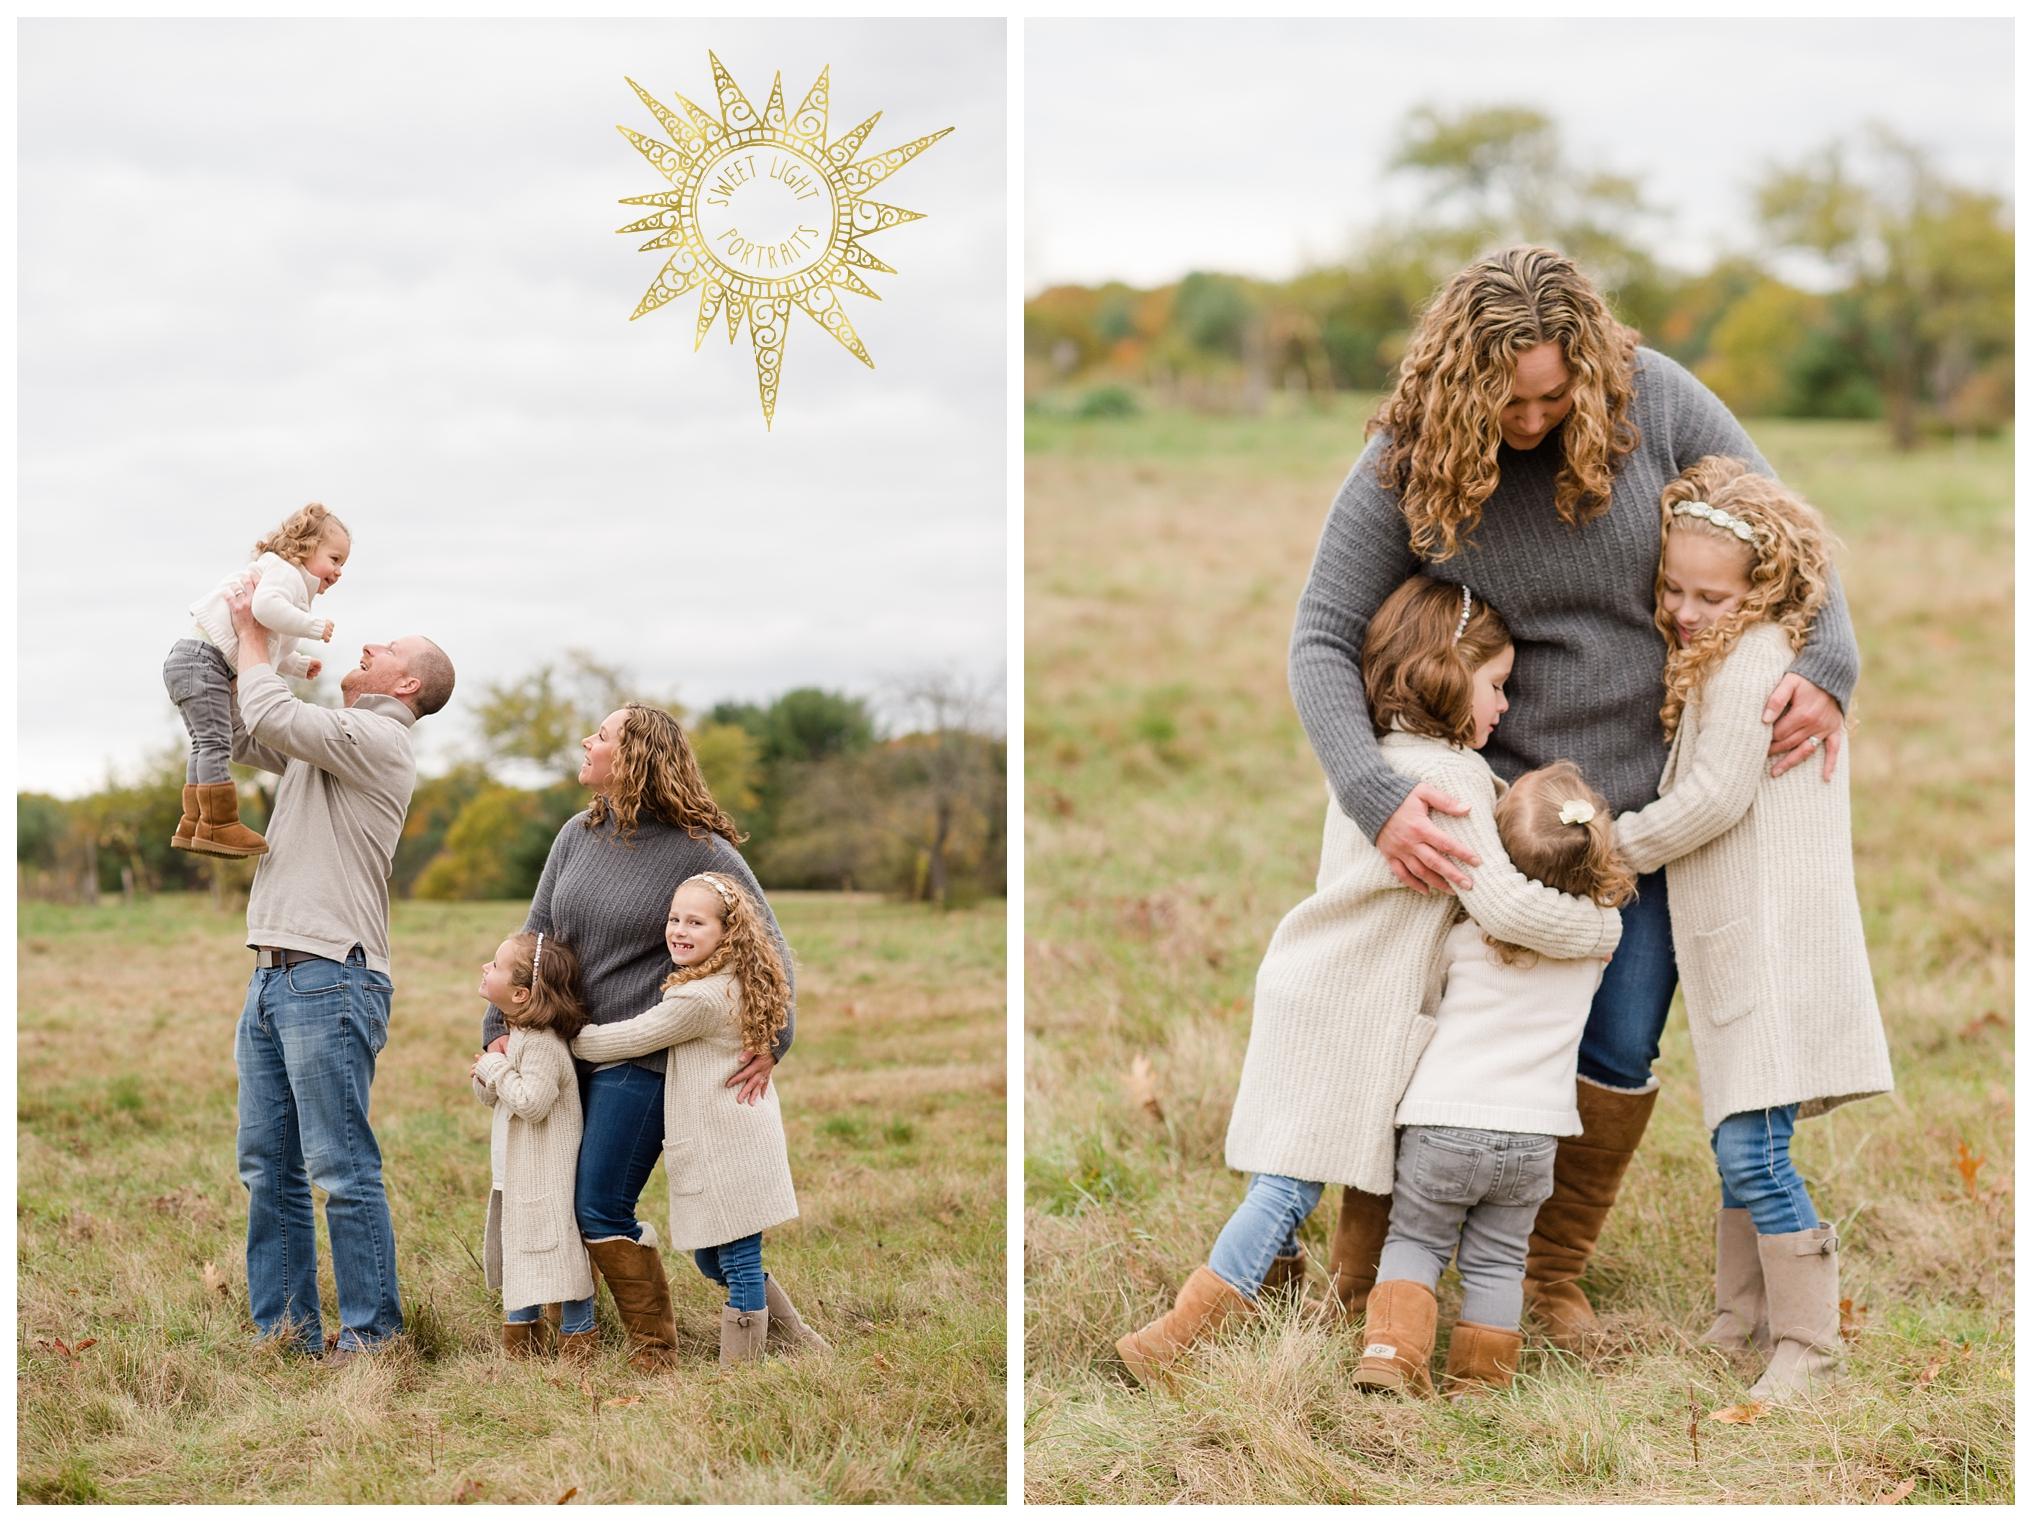 Fall-Family-Photos-Sweet-Light-Portraits20.jpg